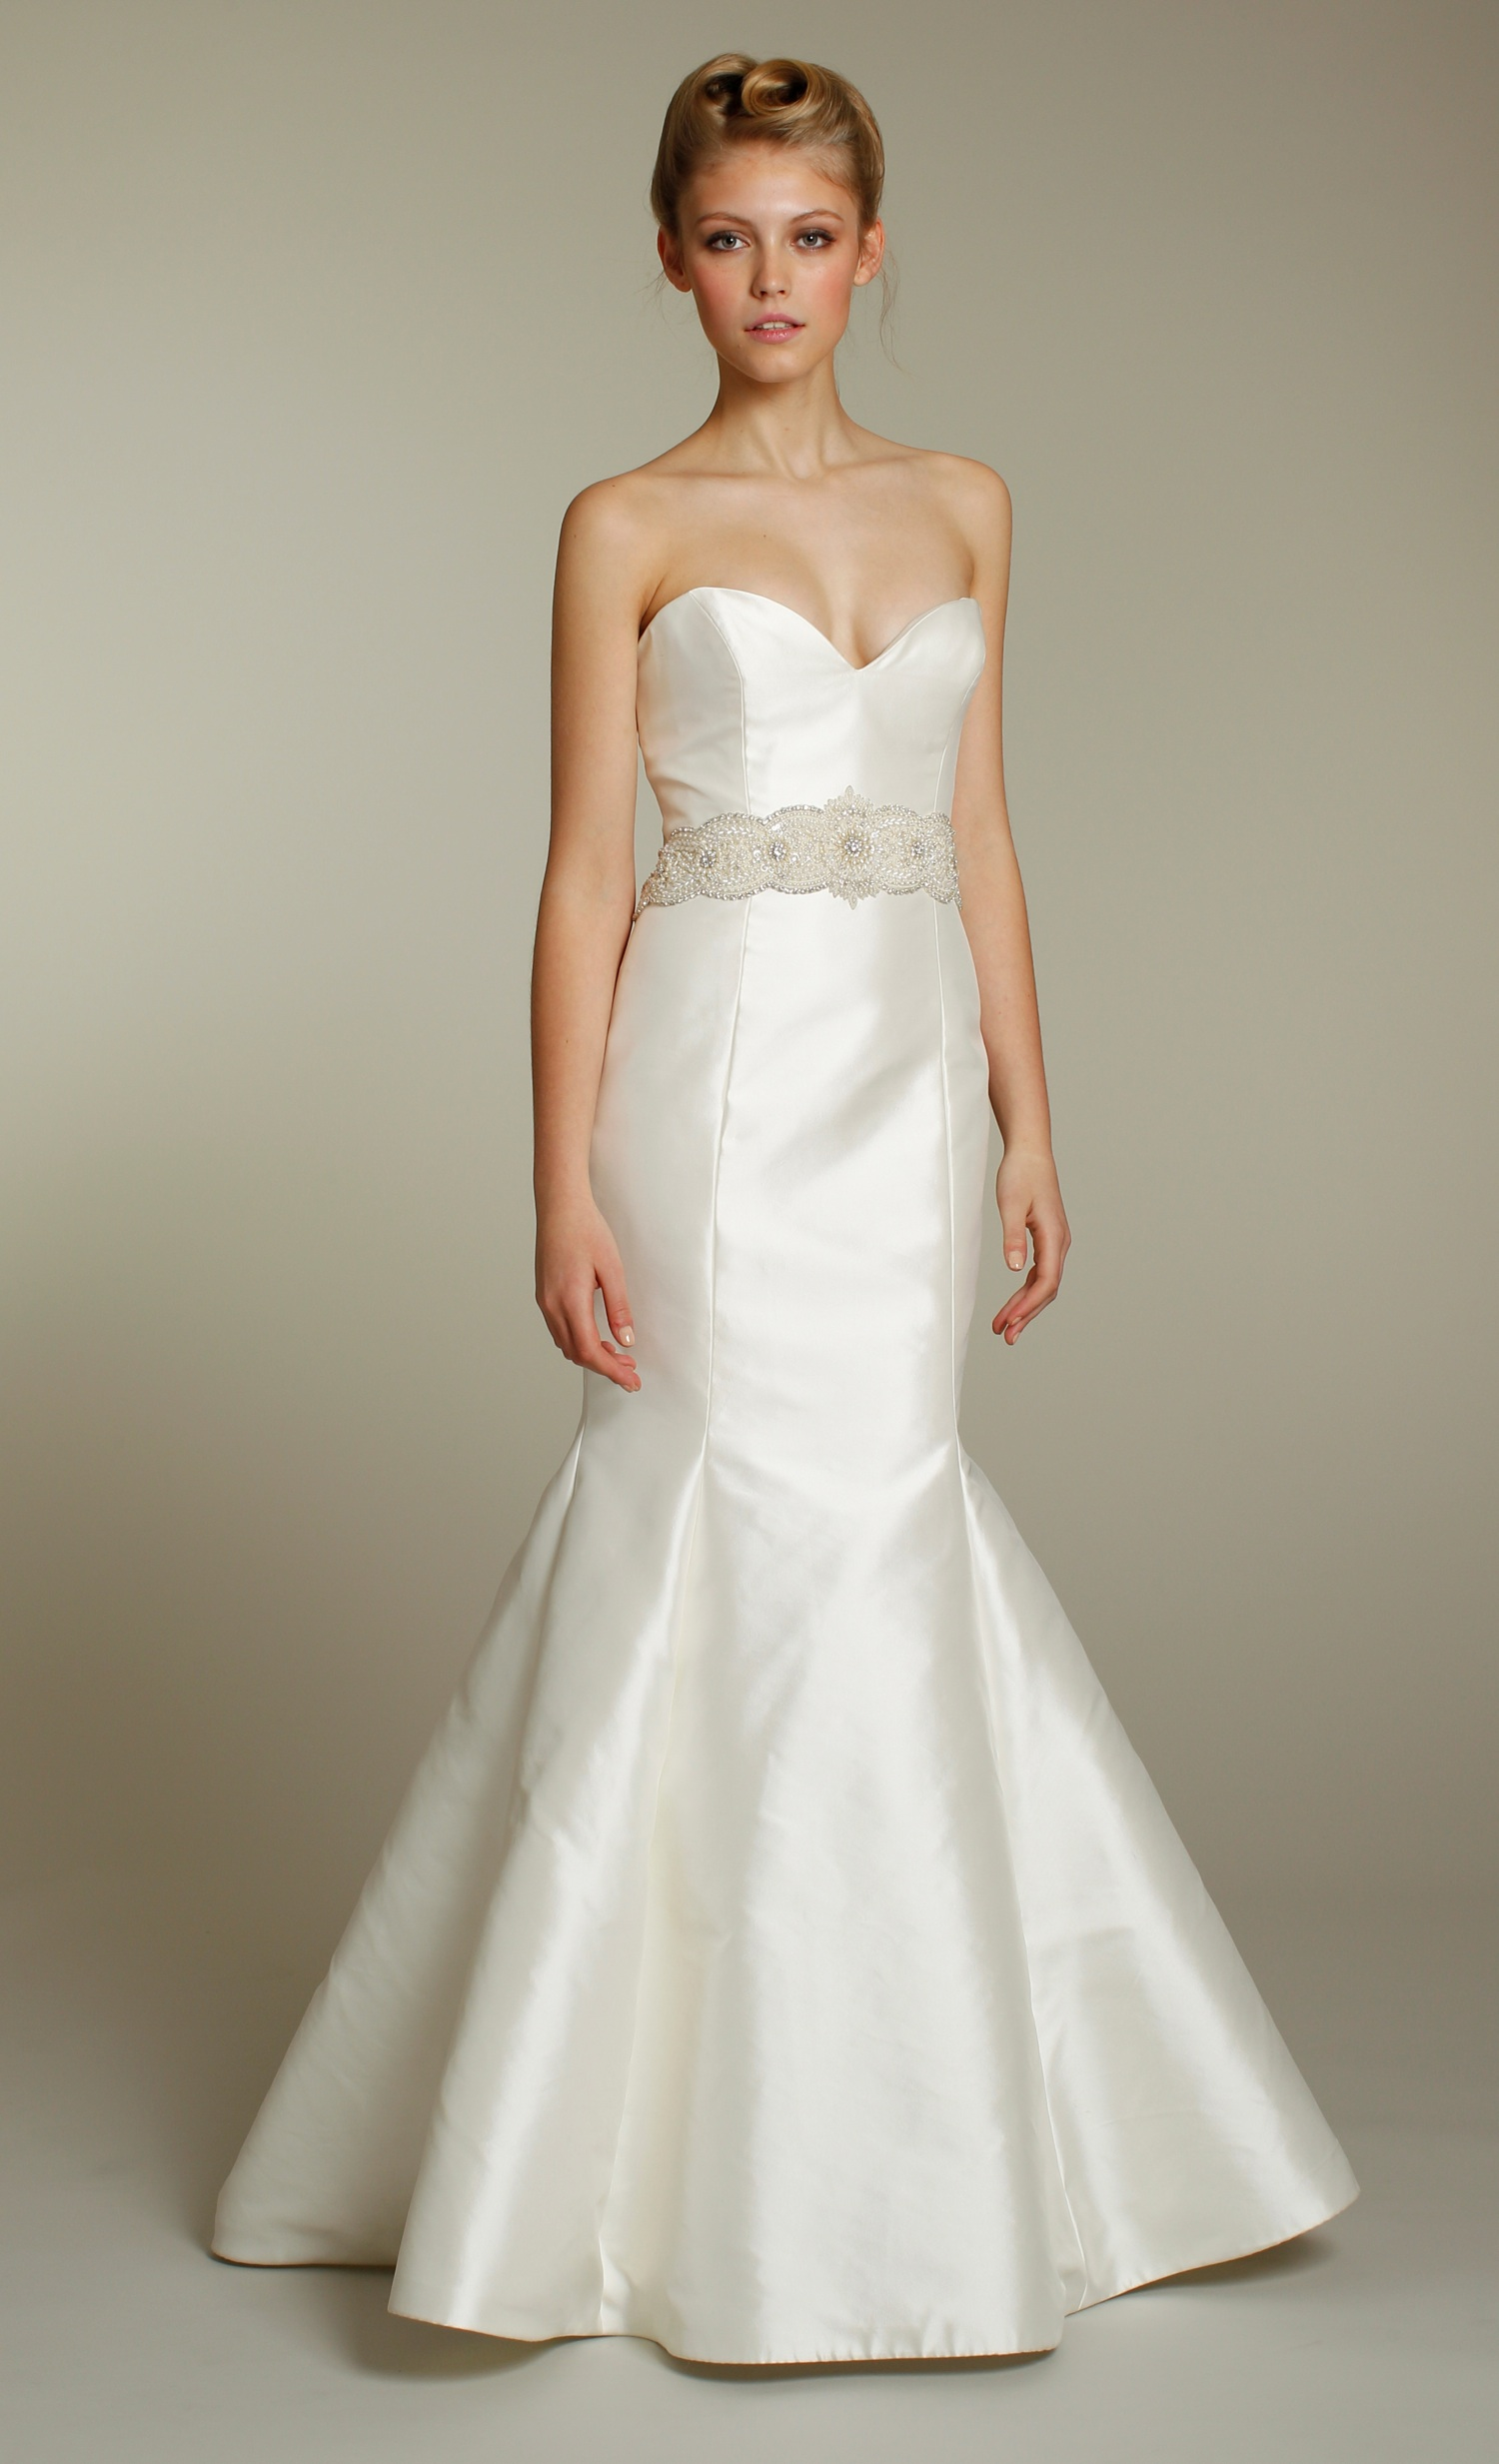 wedding dress sash brooch wedding belts for dresses Wedding Dress Sash Brooch